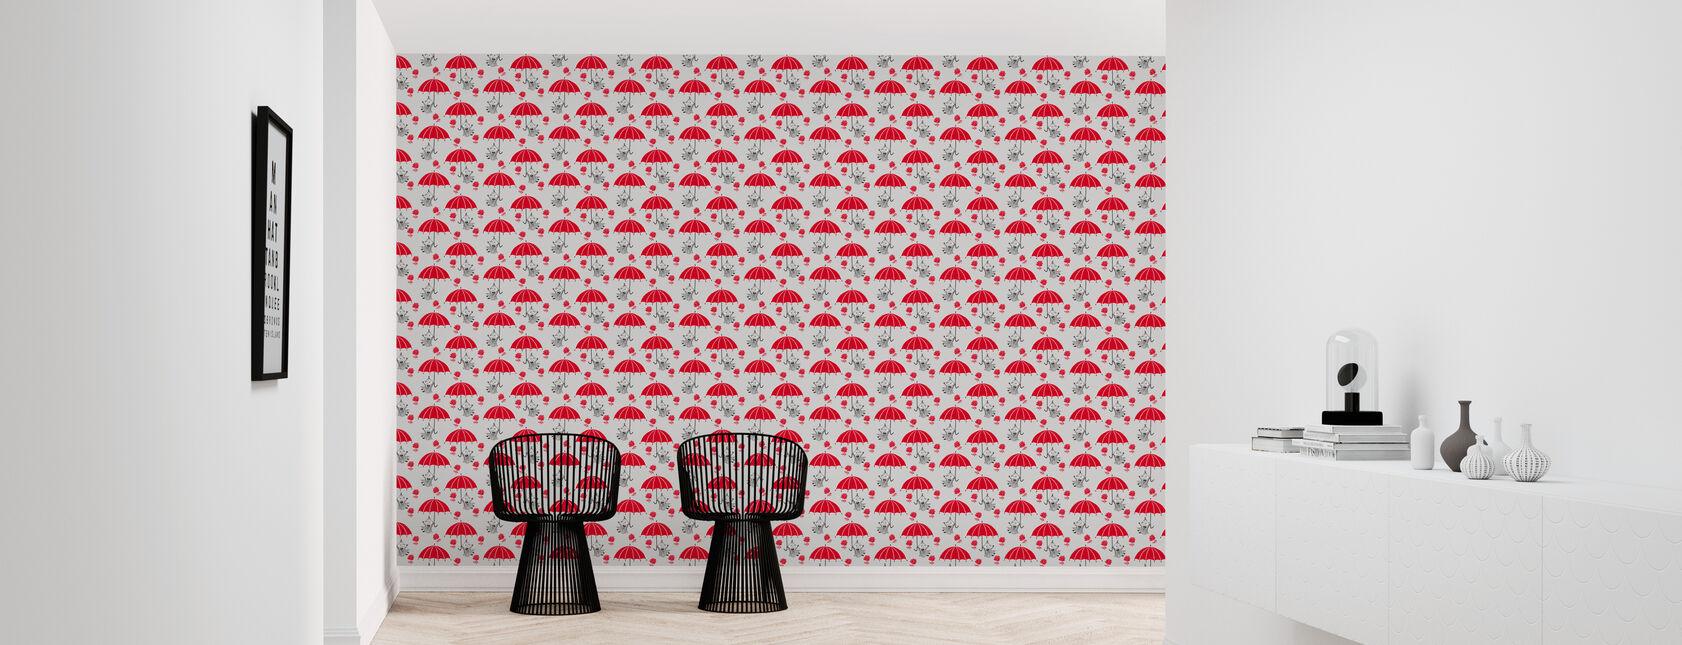 Moomin - Little My with Umbrellas - Wallpaper - Hallway